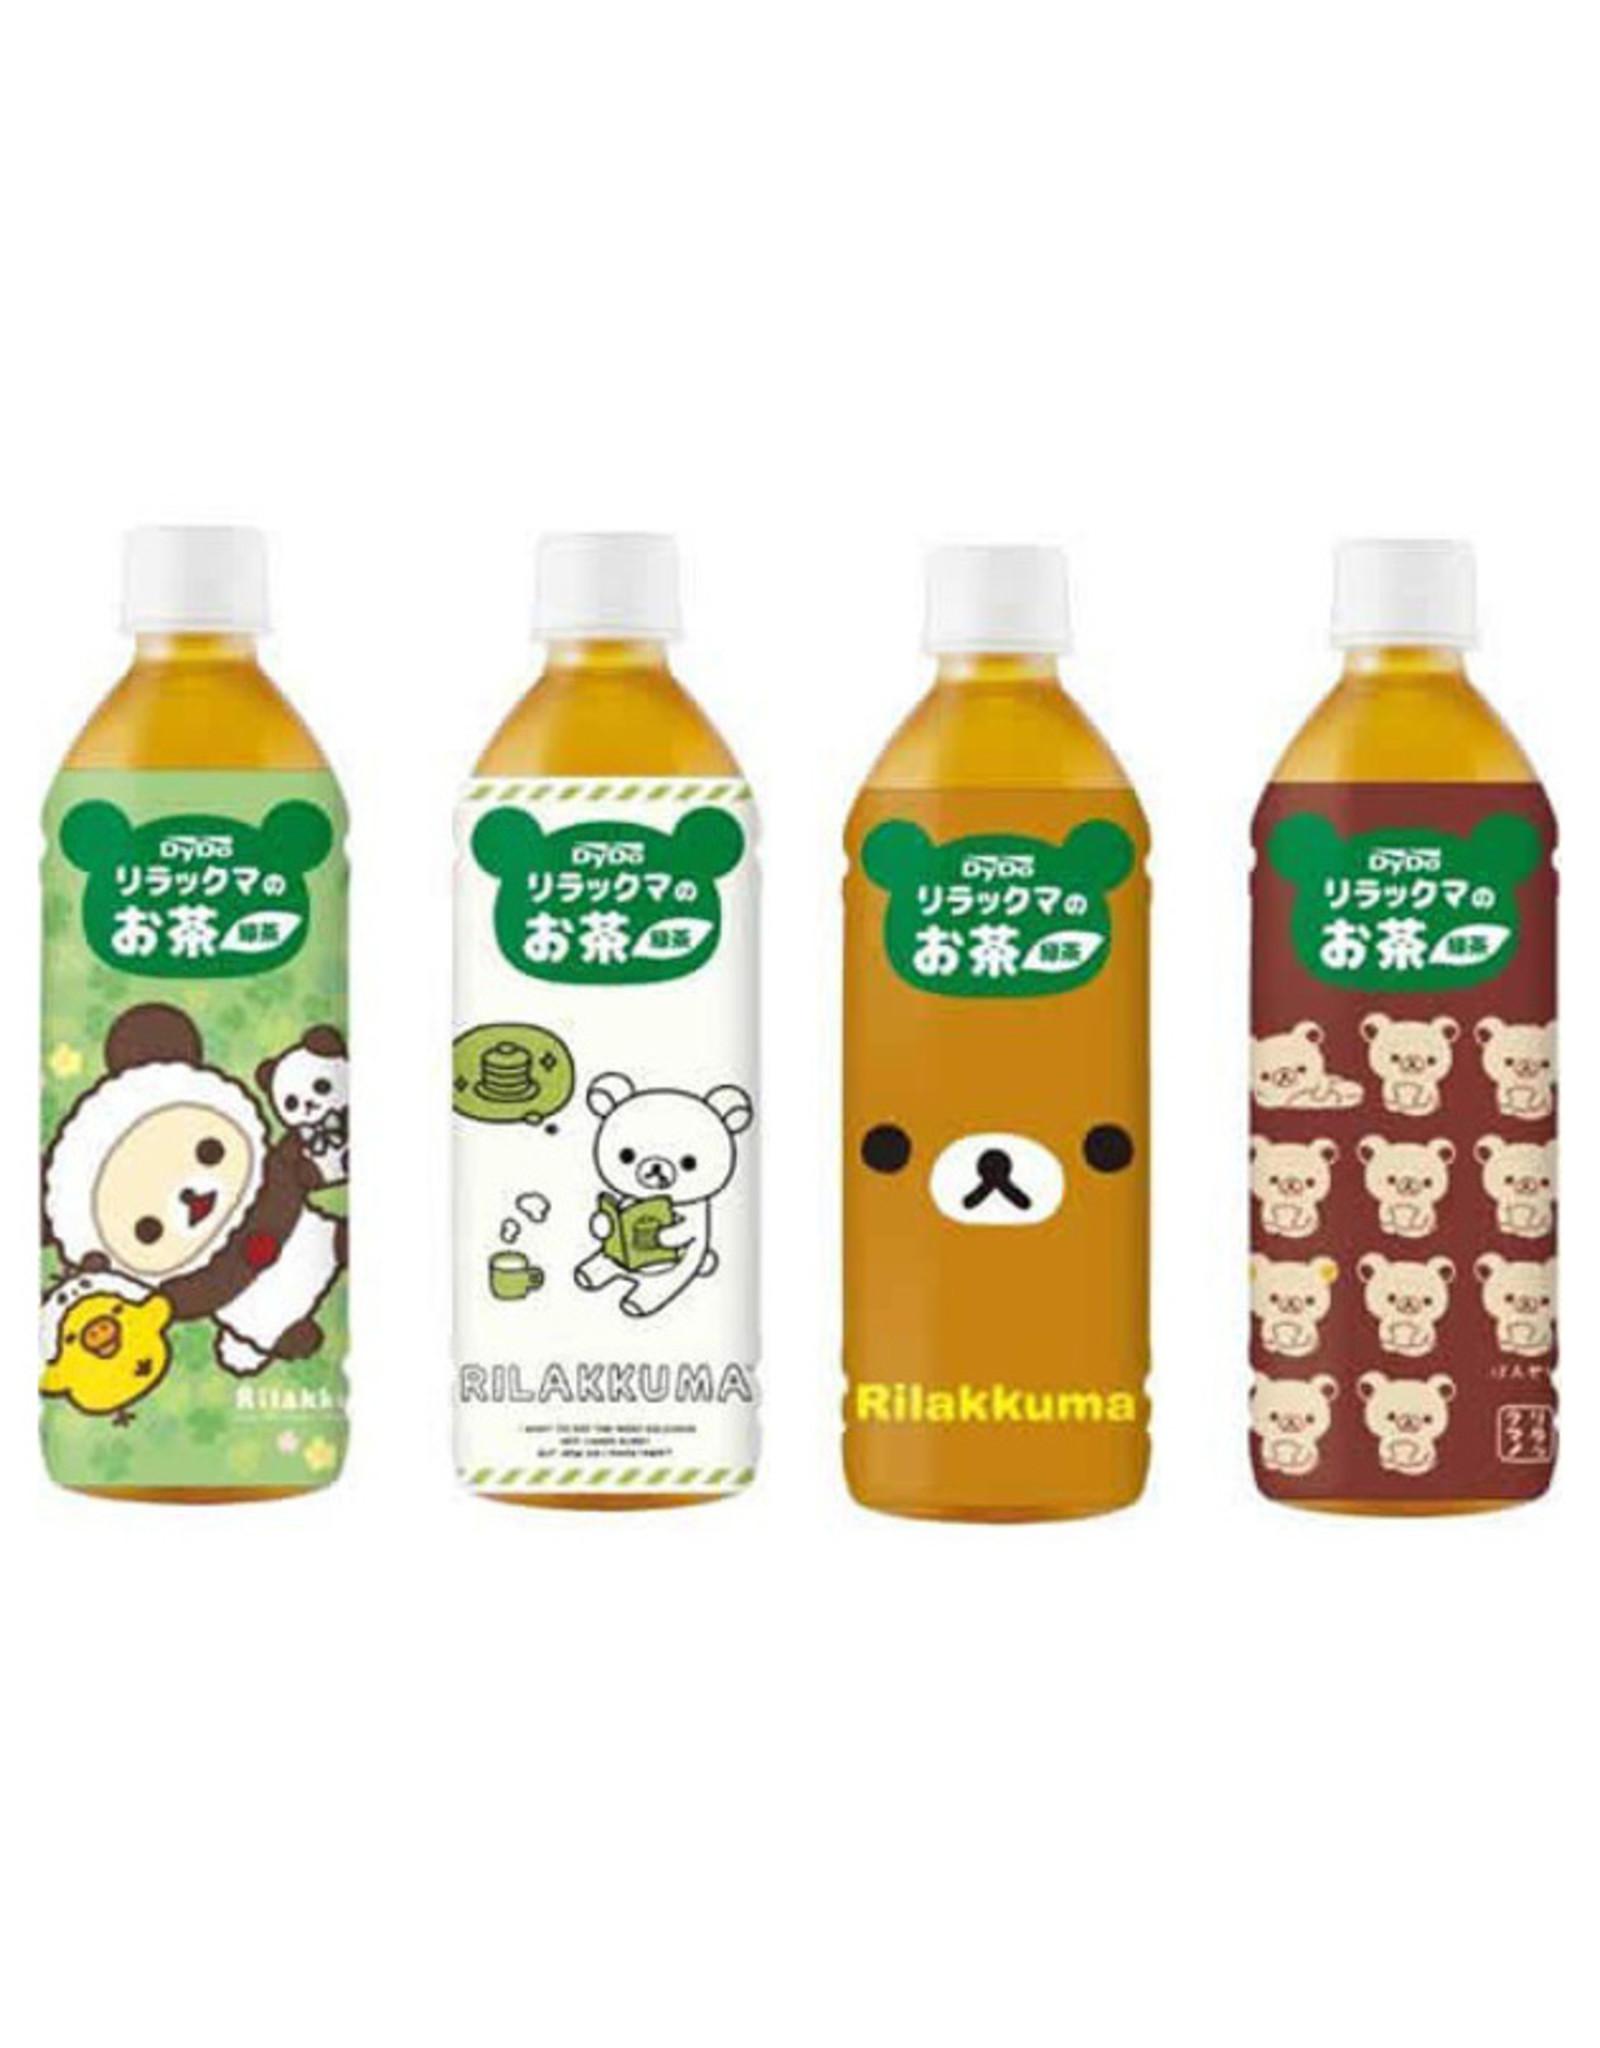 Rilakkuma Green Tea - 500ml